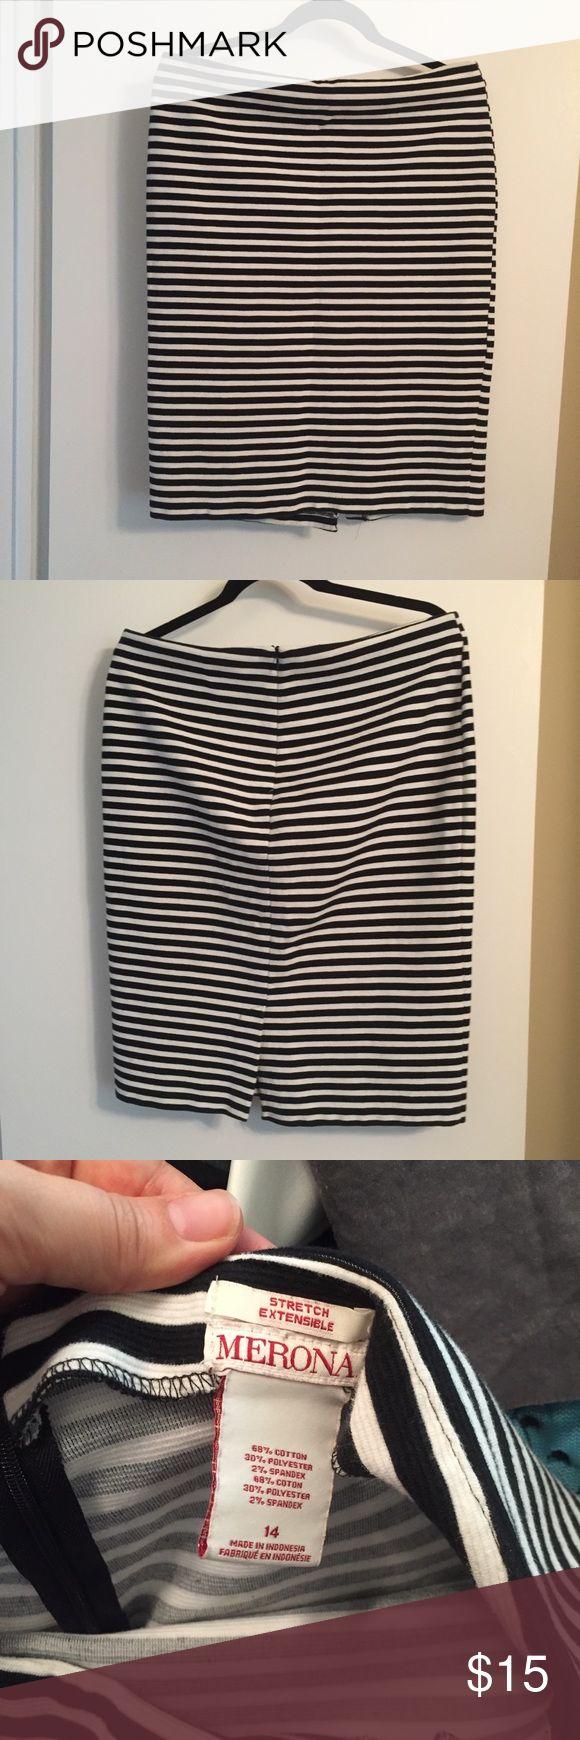 Merona - black and white striped pencil skirt Black and white striped pencil skirt, a classic look and classic silhouette! Merona Skirts Pencil